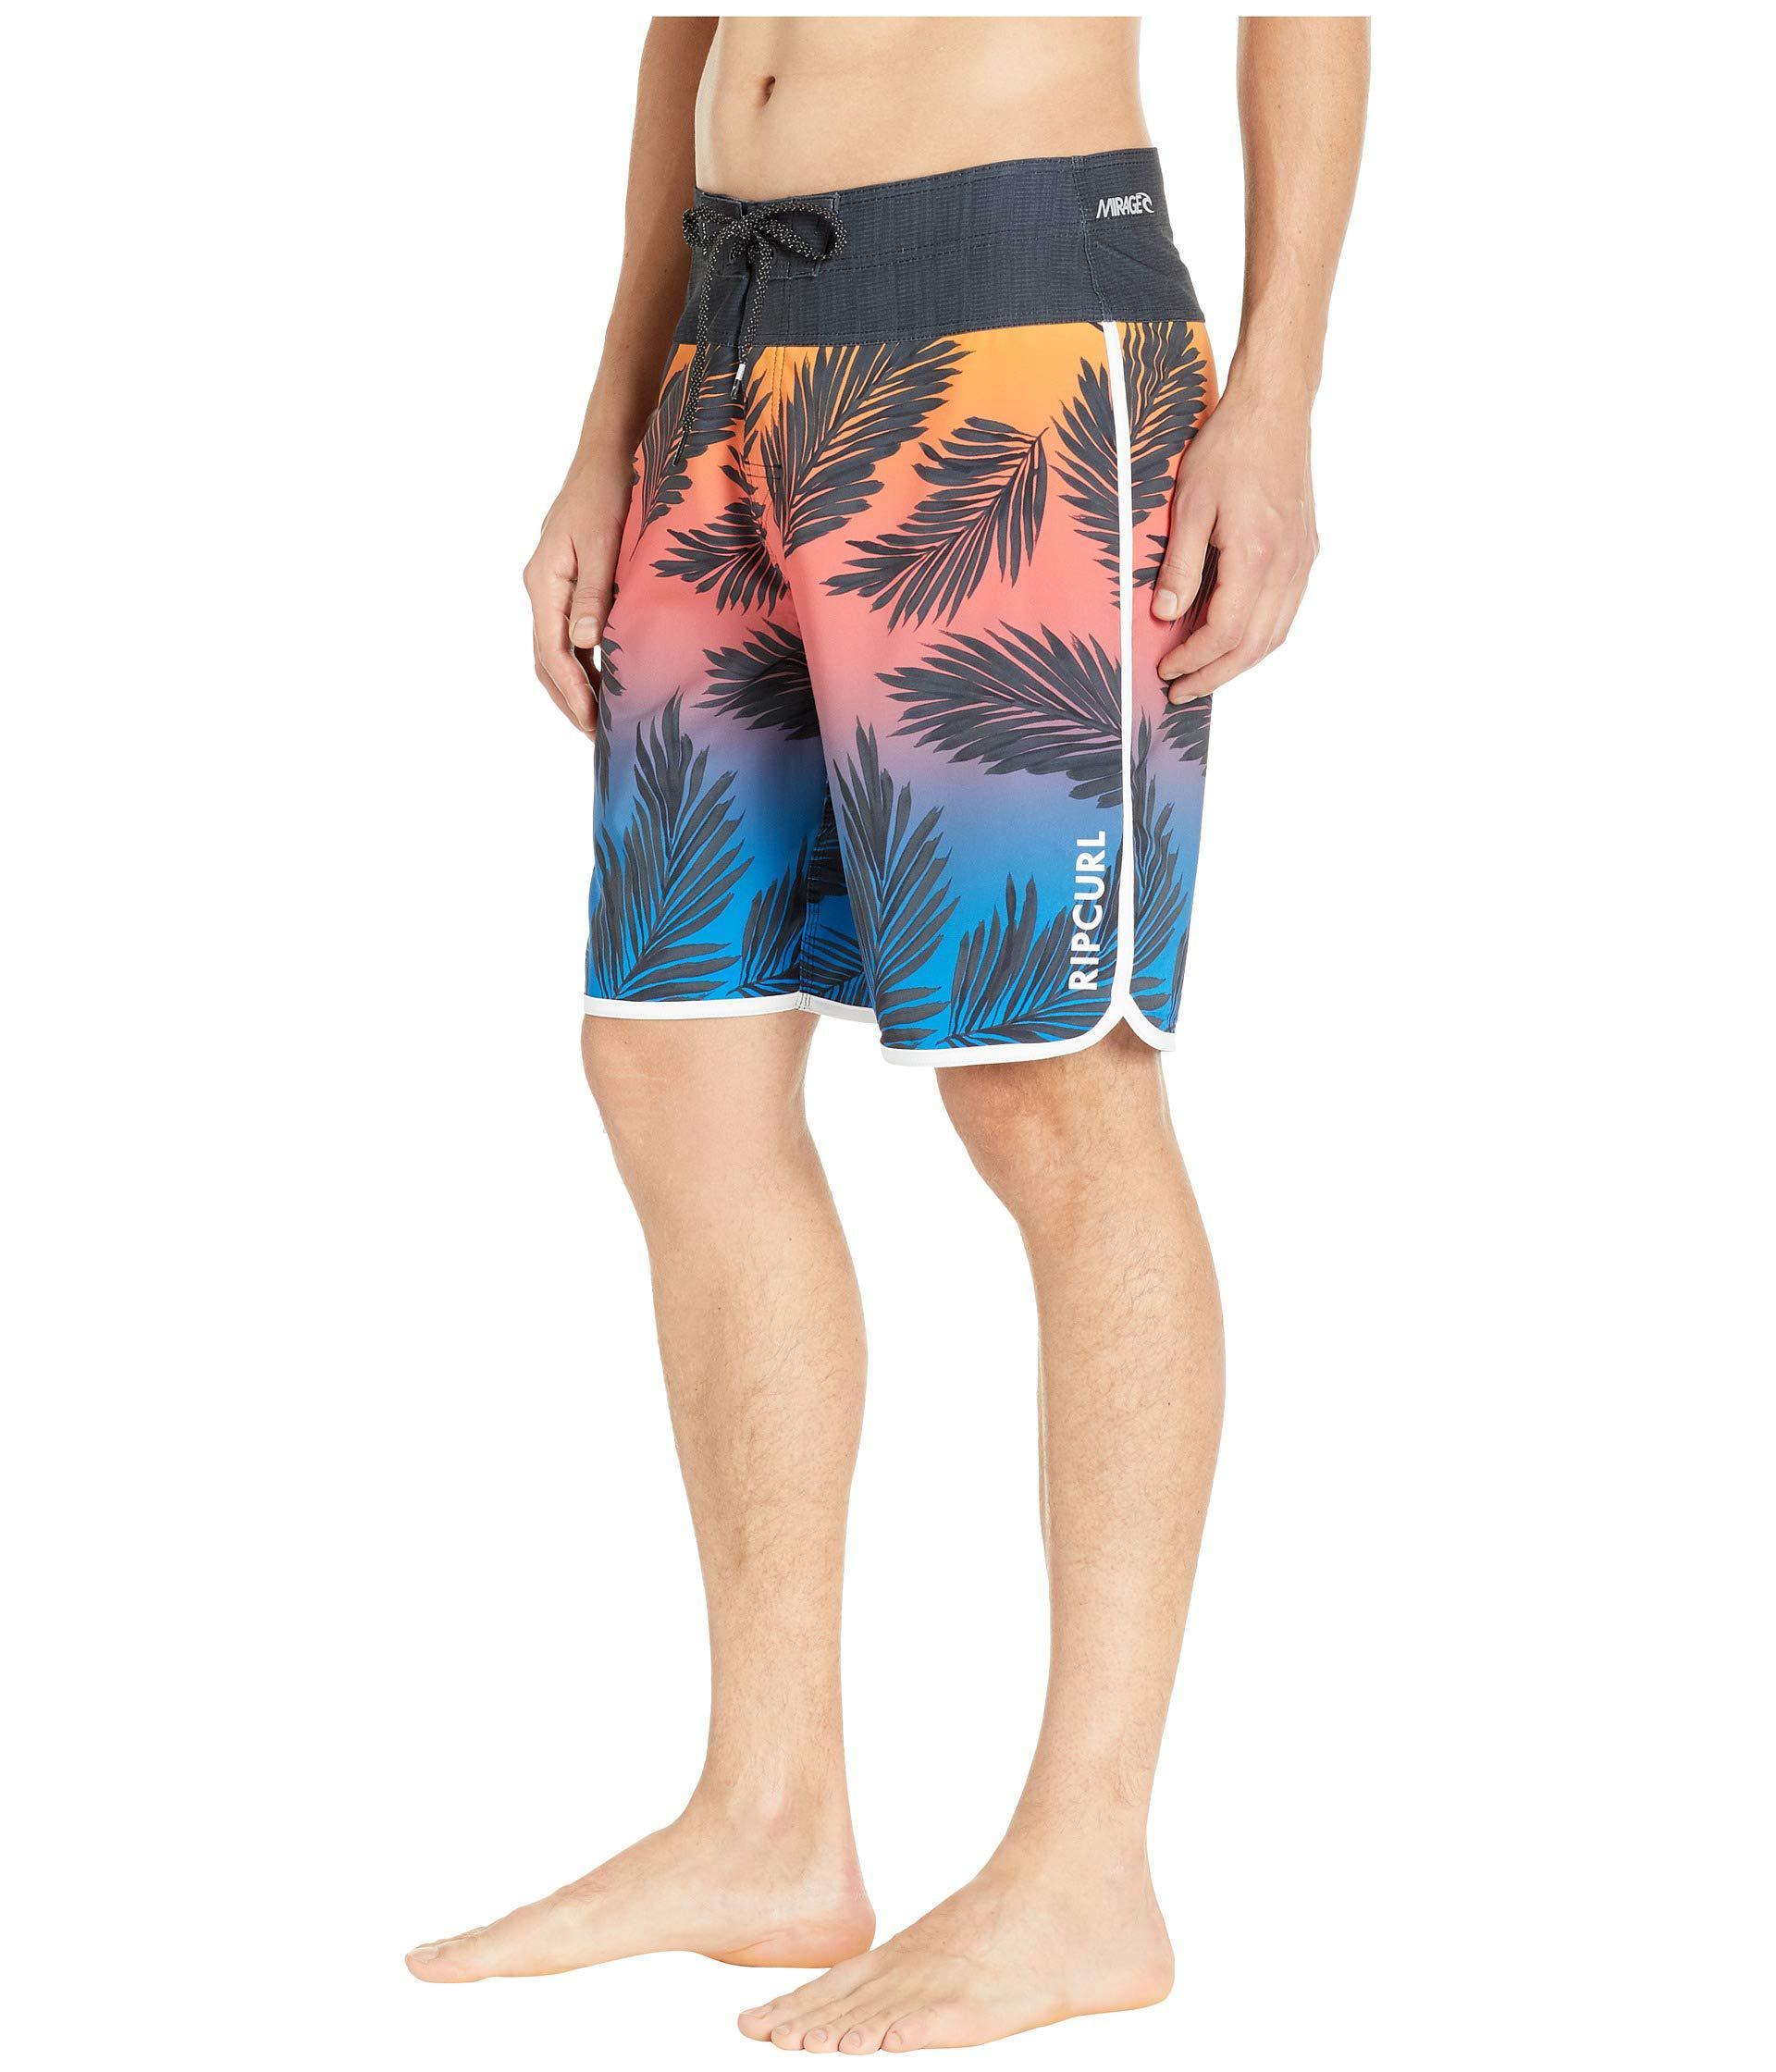 ecc6c4d9f5b Lyst - Rip Curl Mirage Mason Rockies Boardshorts (black/black) Men's  Swimwear in Black for Men